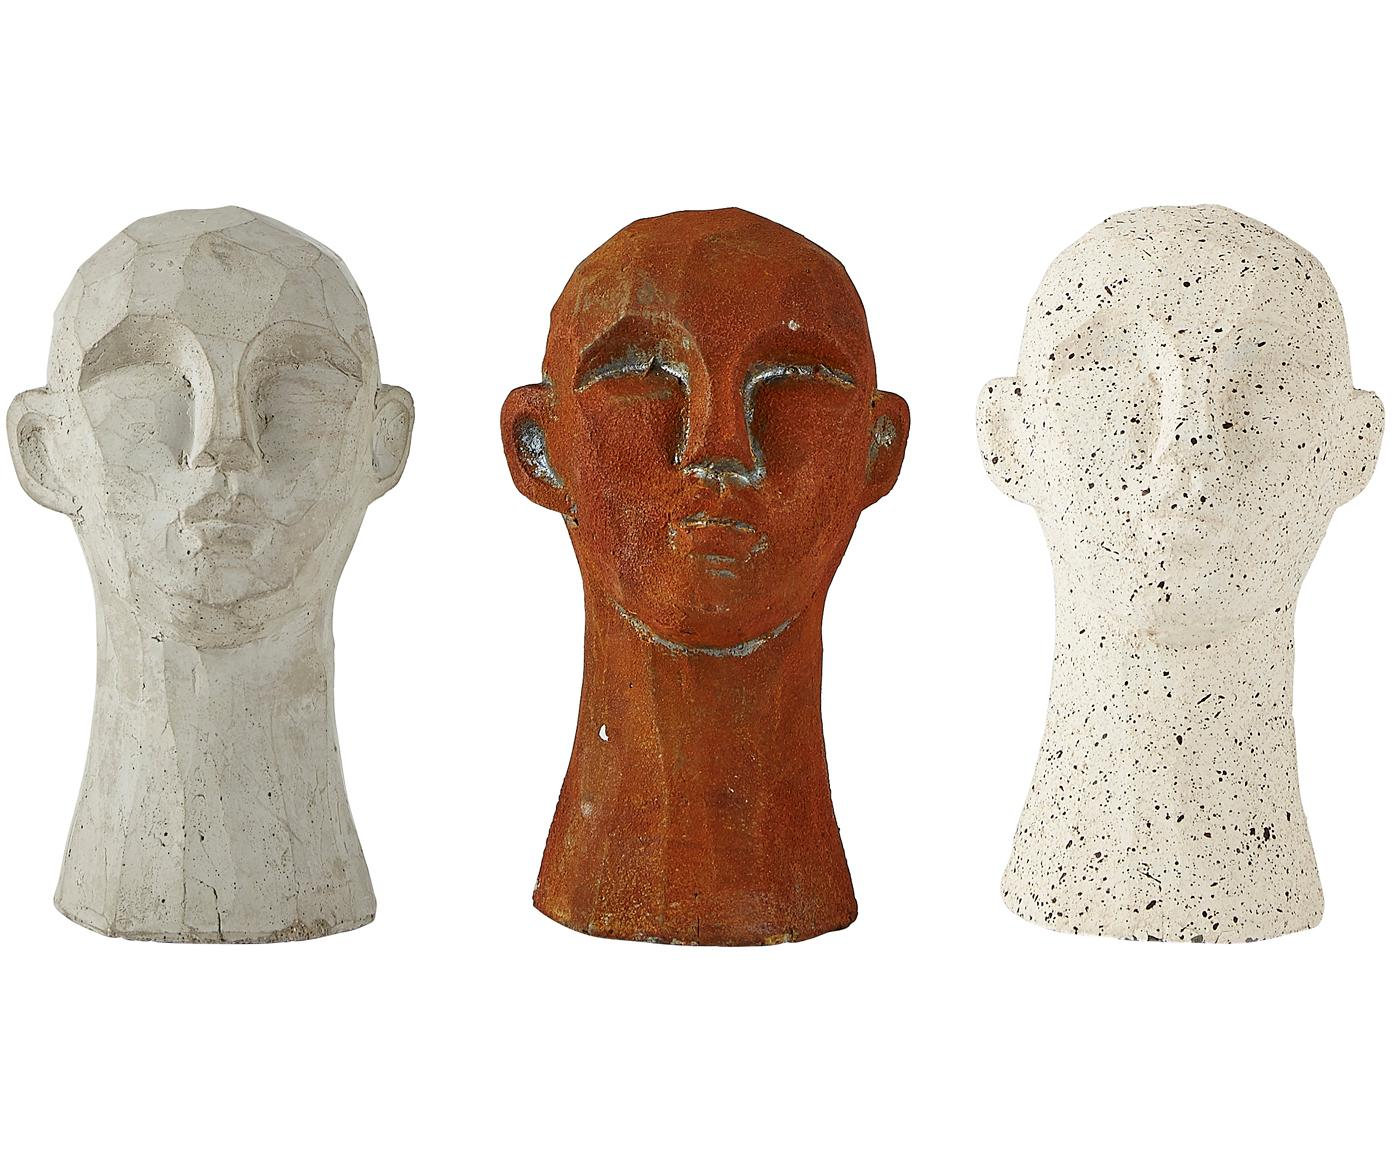 Decoratieve objectenset Figure Head, 3-delig , Beton, Multicolour, Ø 9 x H 15 cm